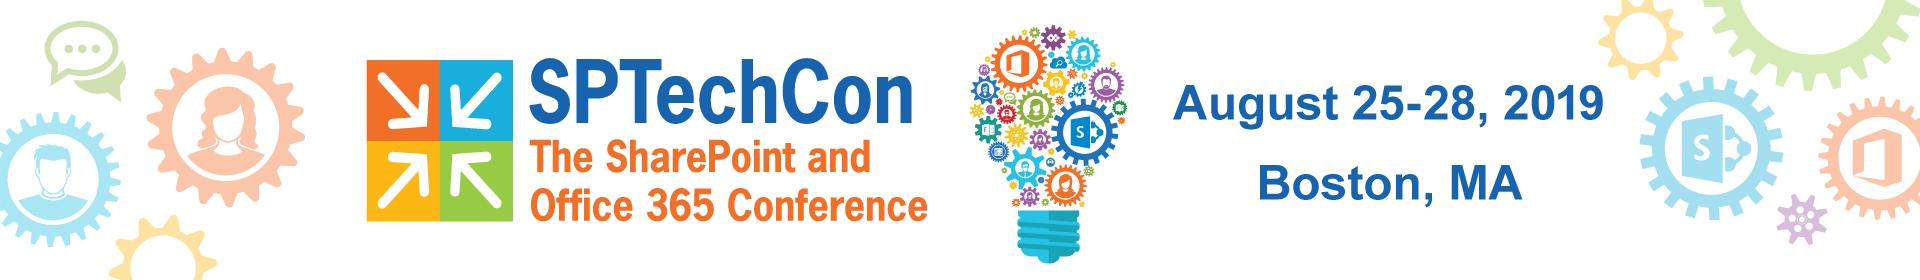 SPTechCon East 2019 Event Banner